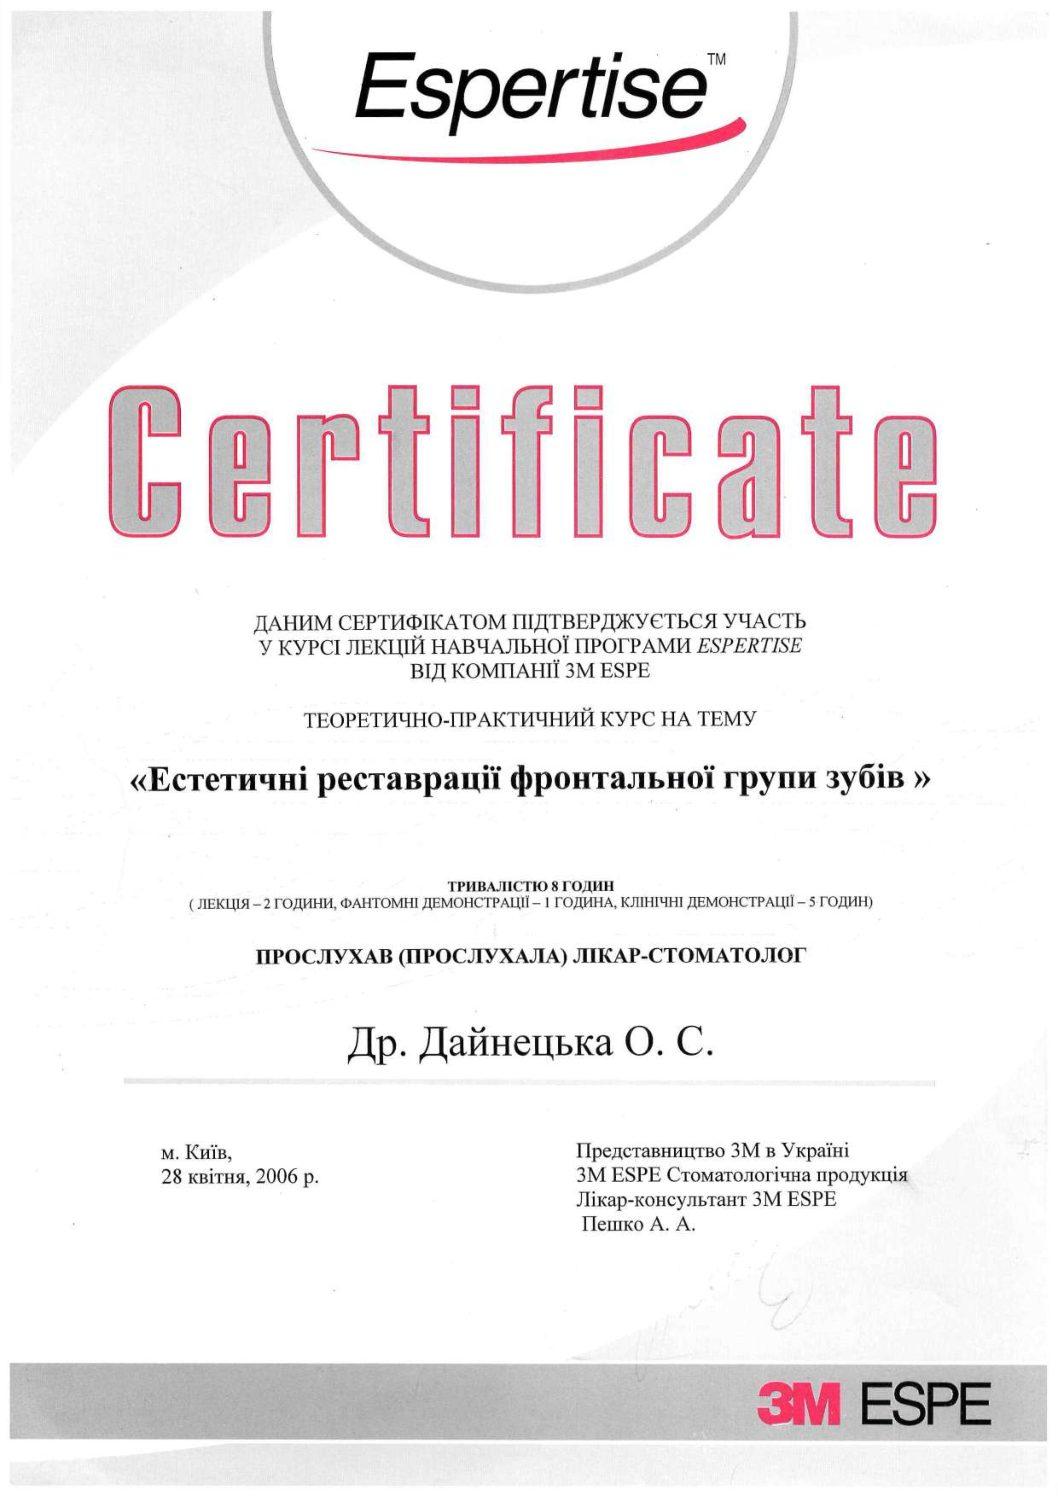 Untitled.FR32.tif compressed pdf - Олена Дайнецька